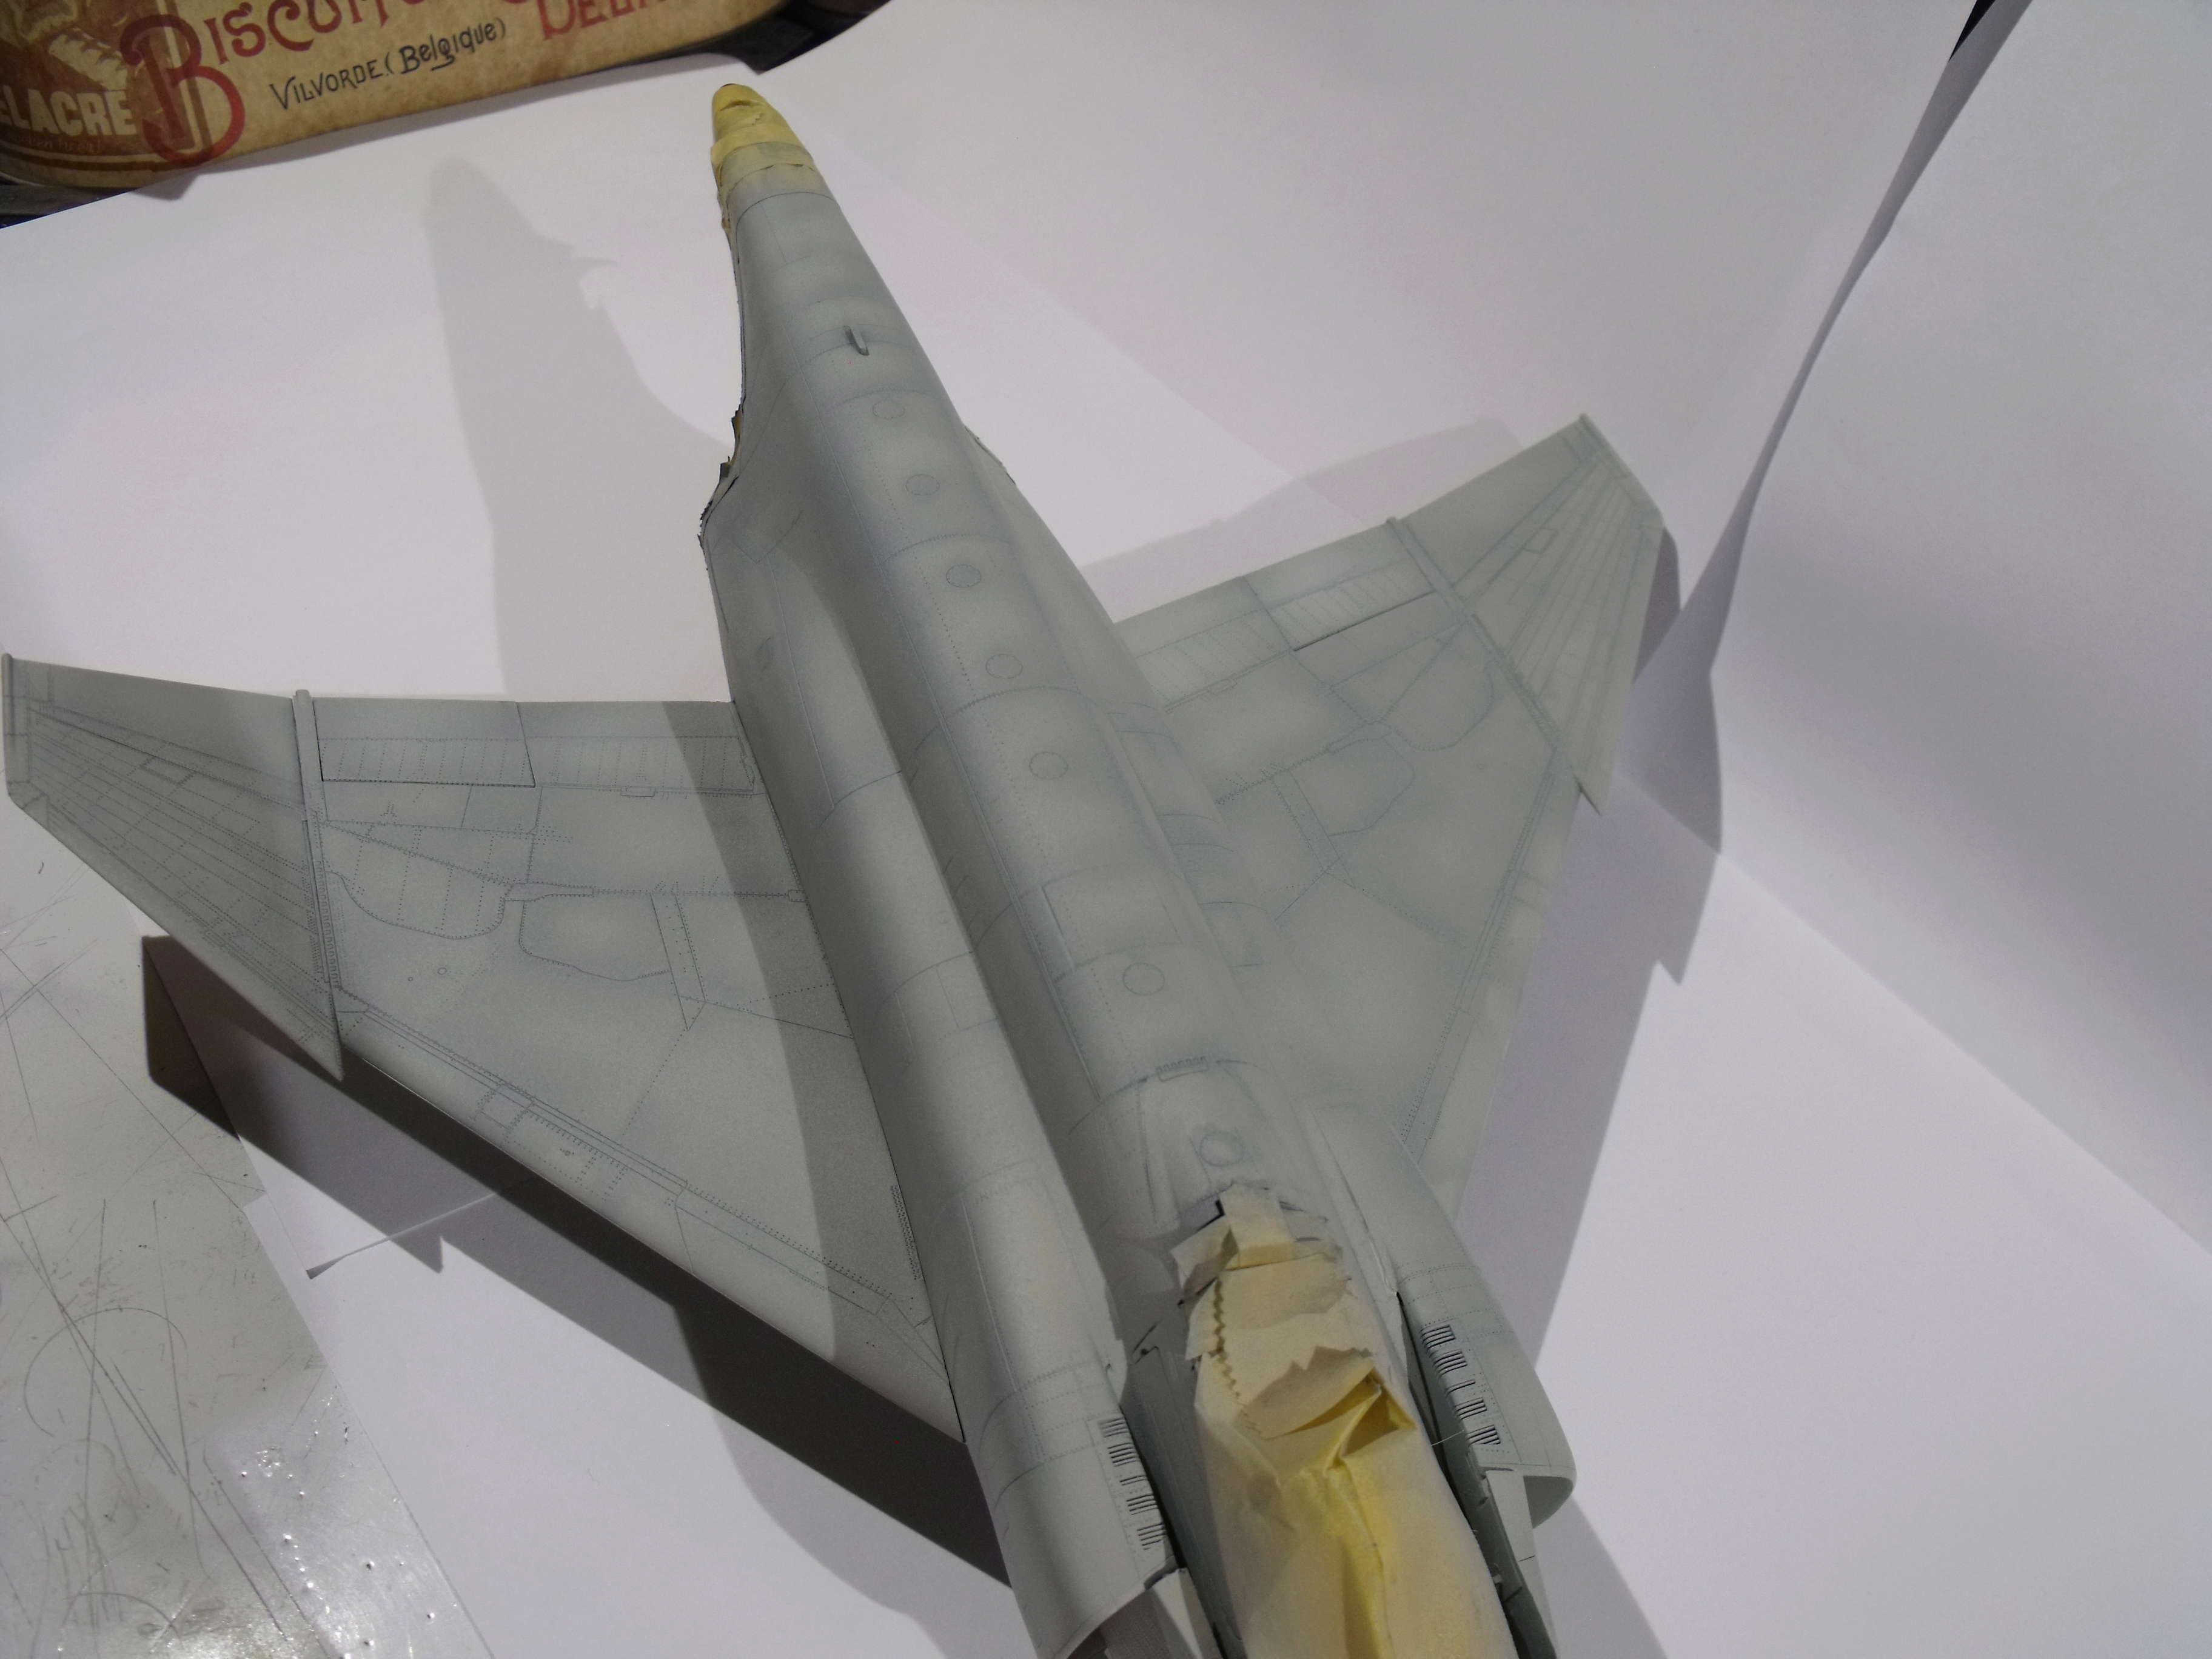 F-4 B Phantom 1/48° - VF-51 - 1972 - Début de patine. - Page 4 Dscf7042